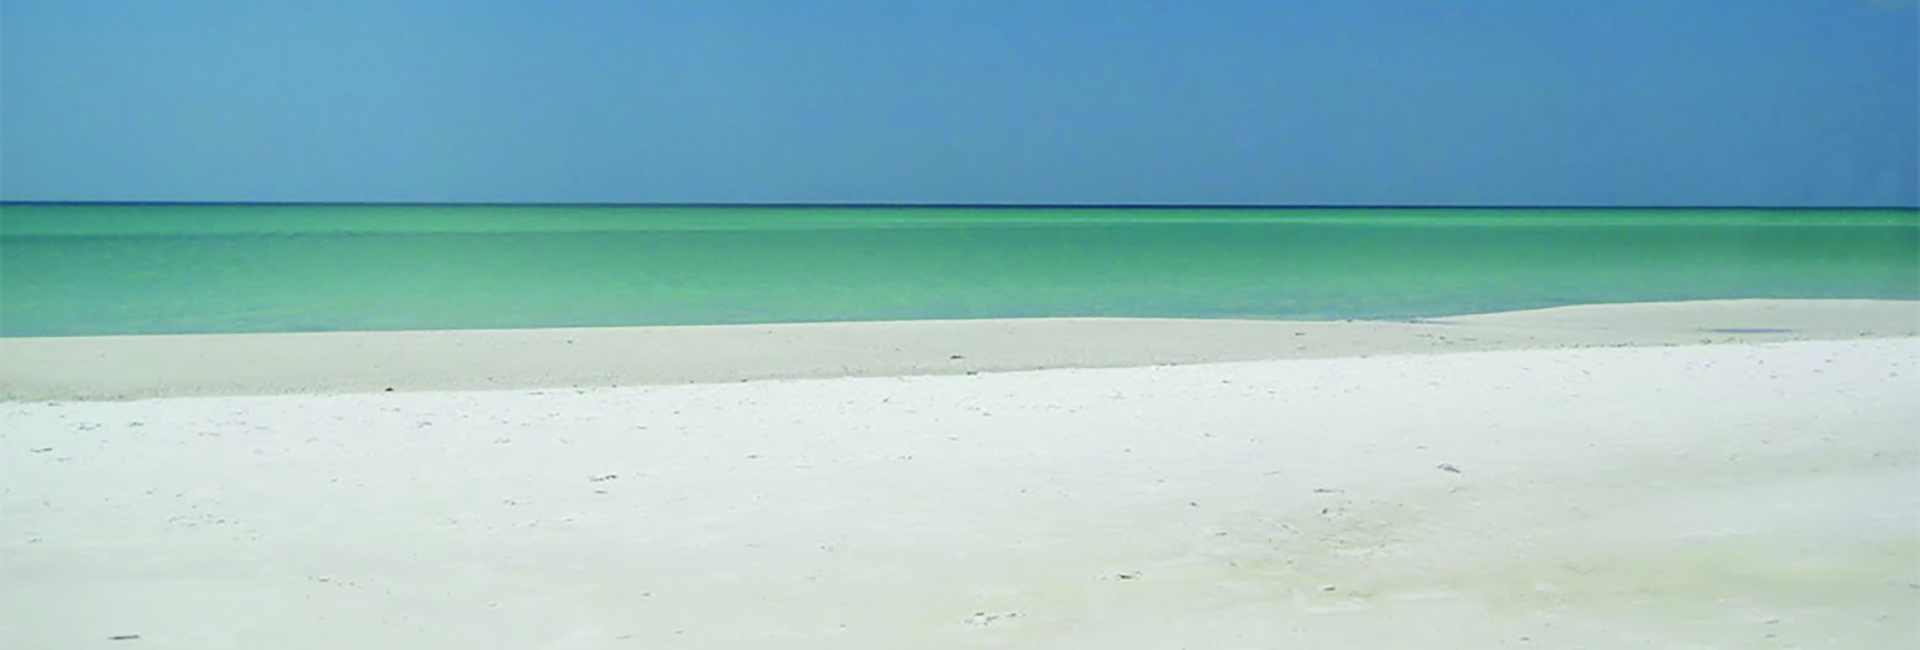 Beach-Walk-Talk-Therapy | drlisamowrey com